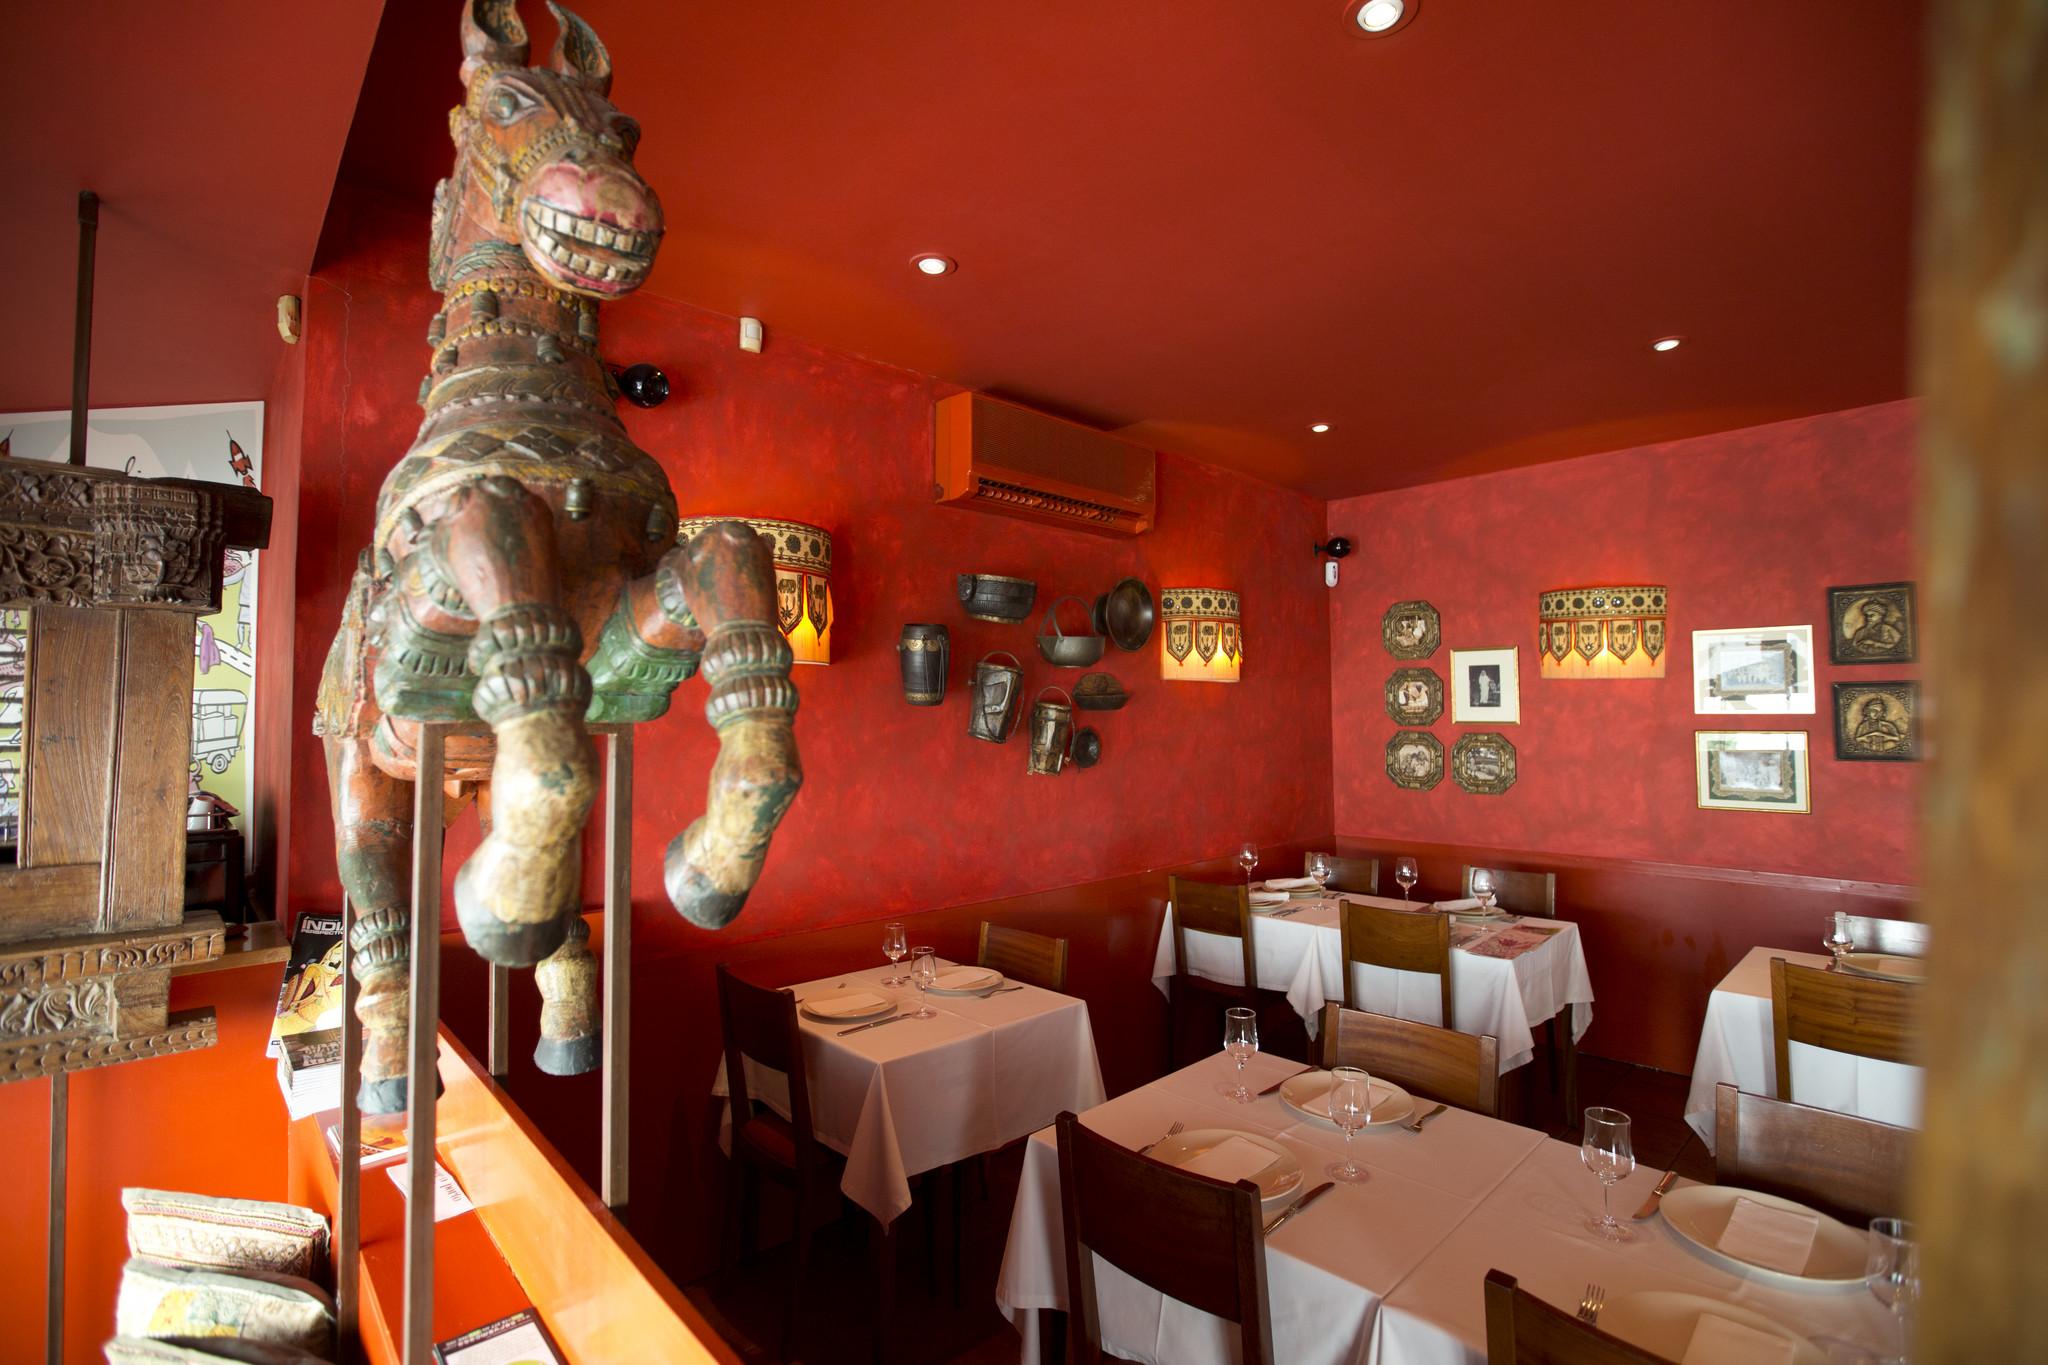 restaurantemendi_rds04.jpg